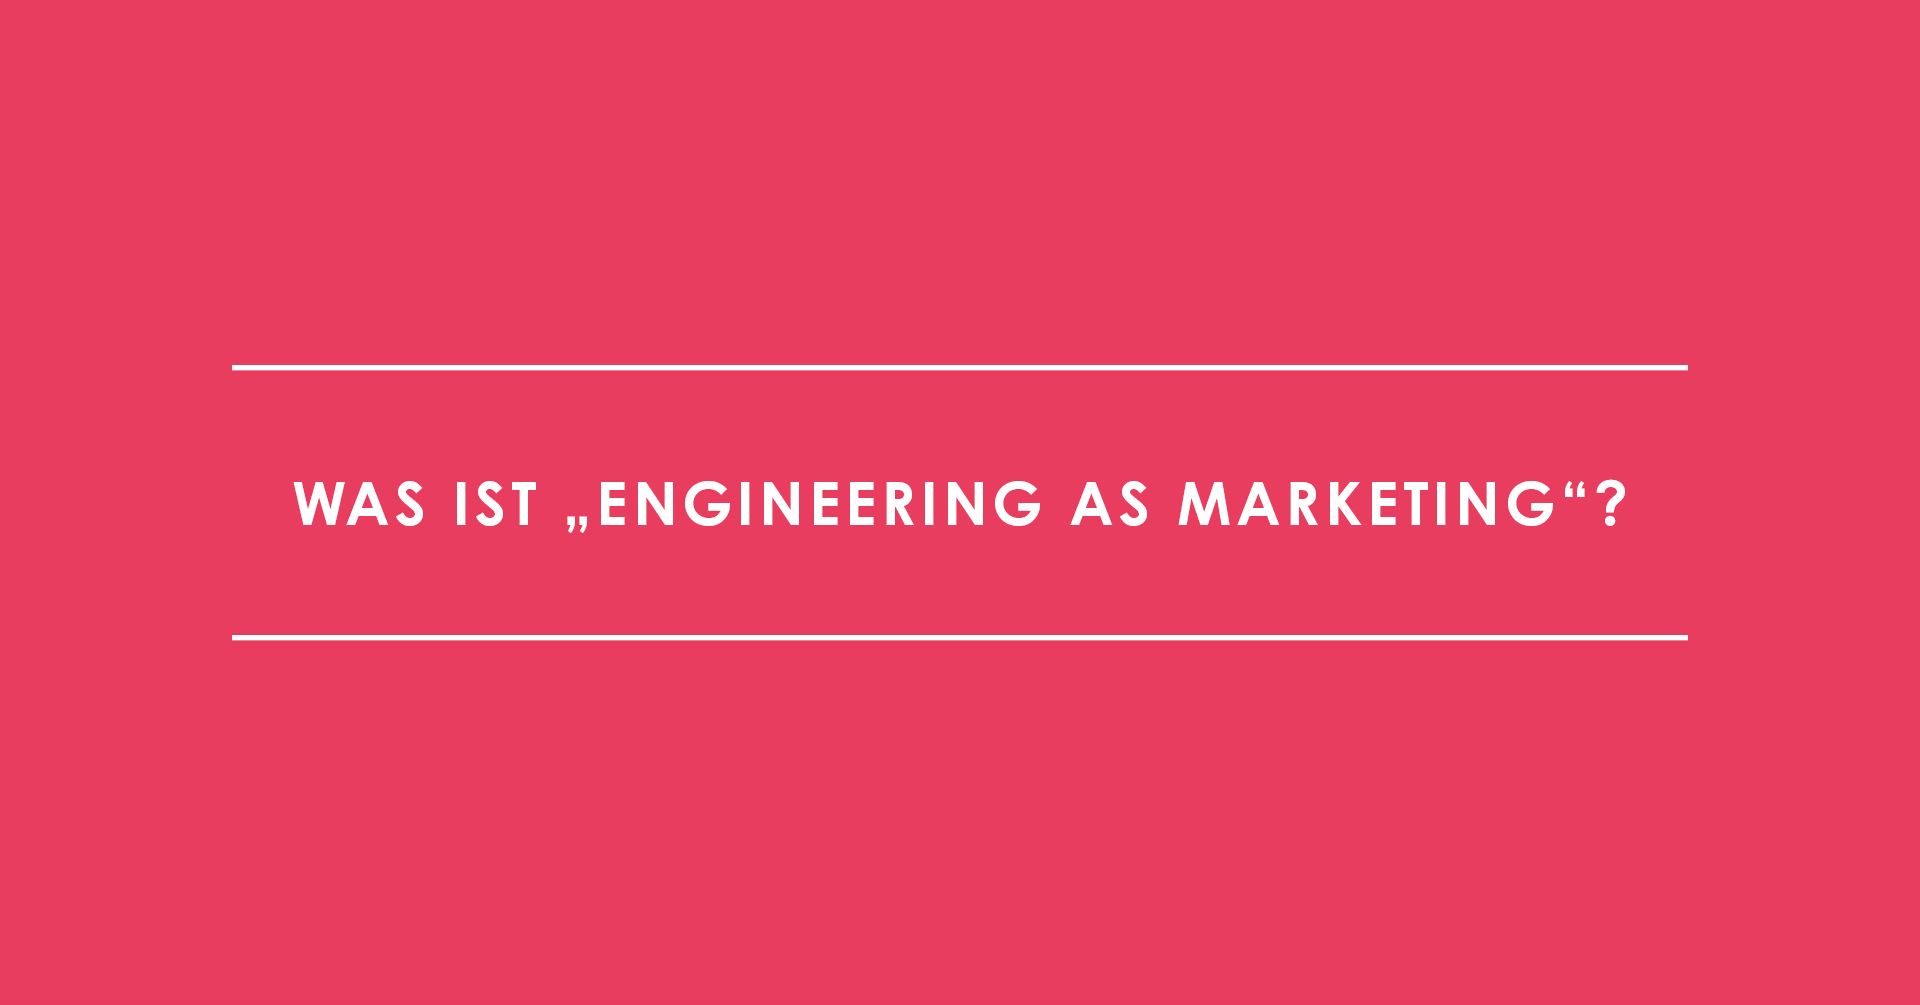 "Was ist ""Engineering as Marketing""?"